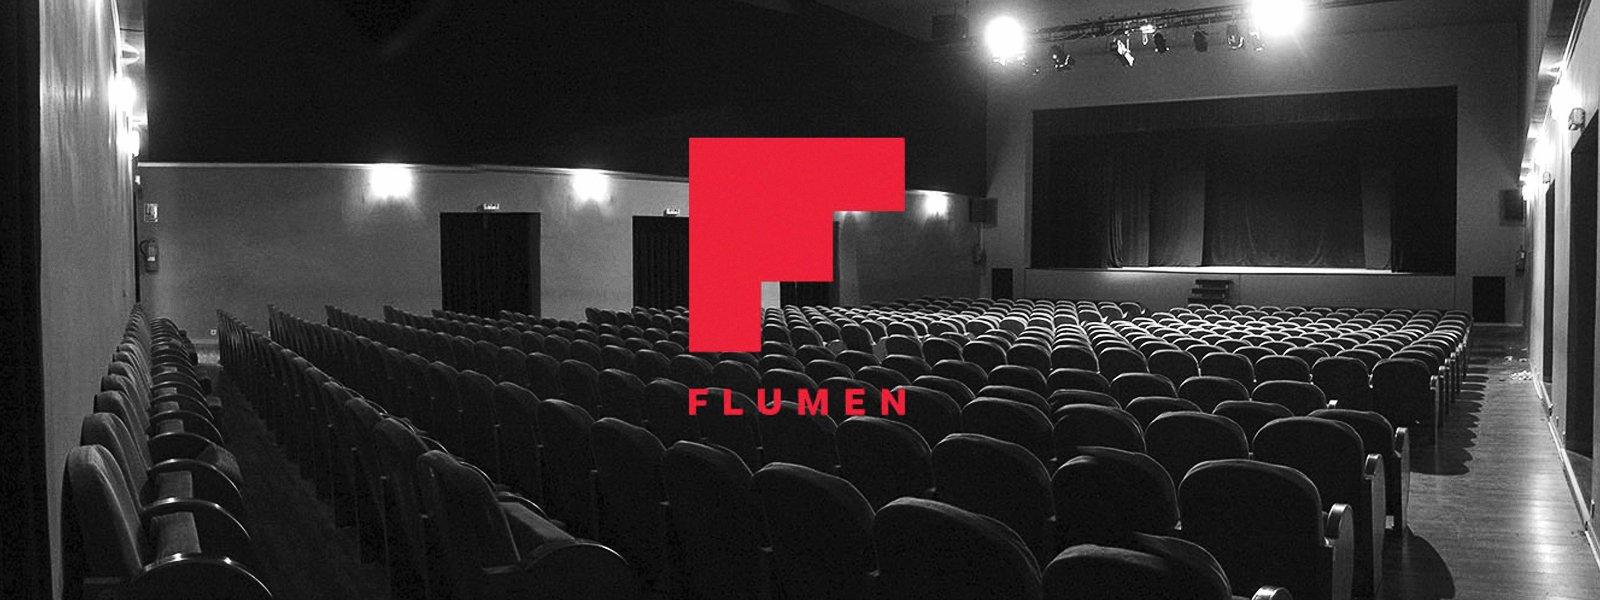 Flumen, venue for shows representation